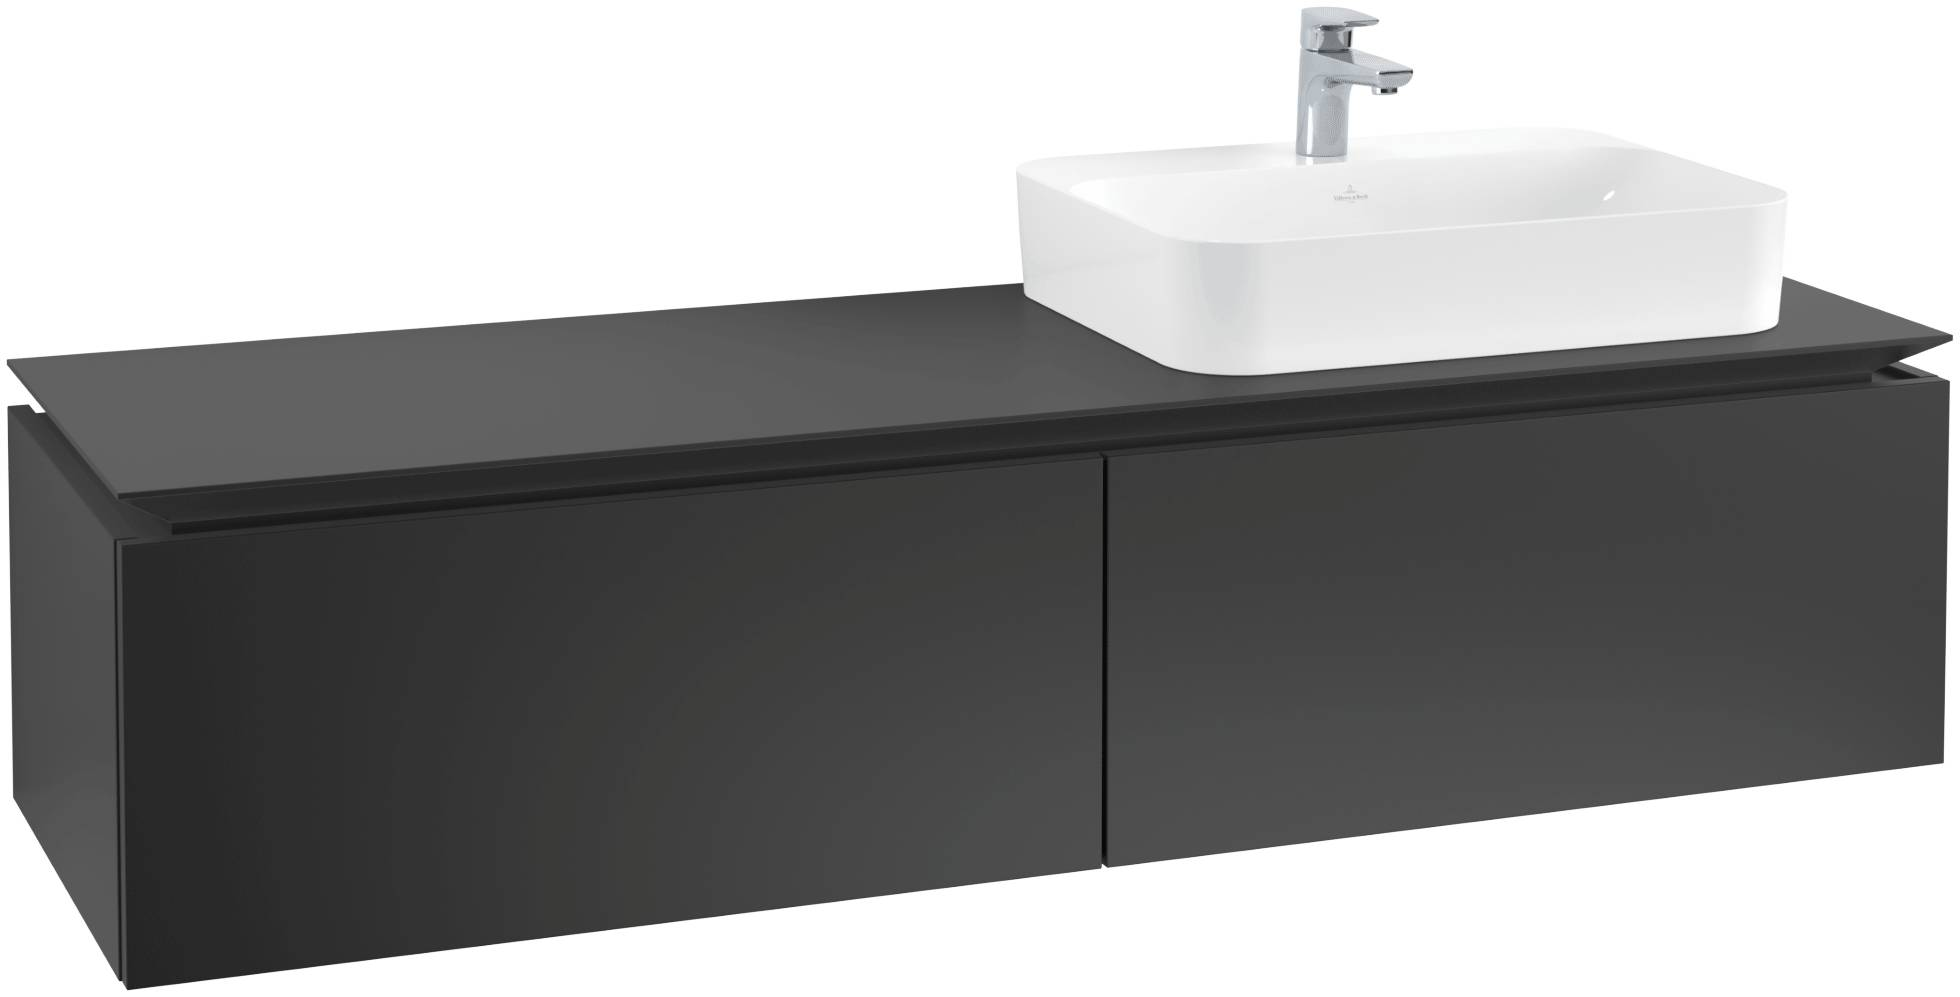 Villeroy & Boch Villeroy & Boch Legato - Meuble sous lavabo with 2 drawers & 1 cut-out right 1600 x 380 x 500mm noir mat